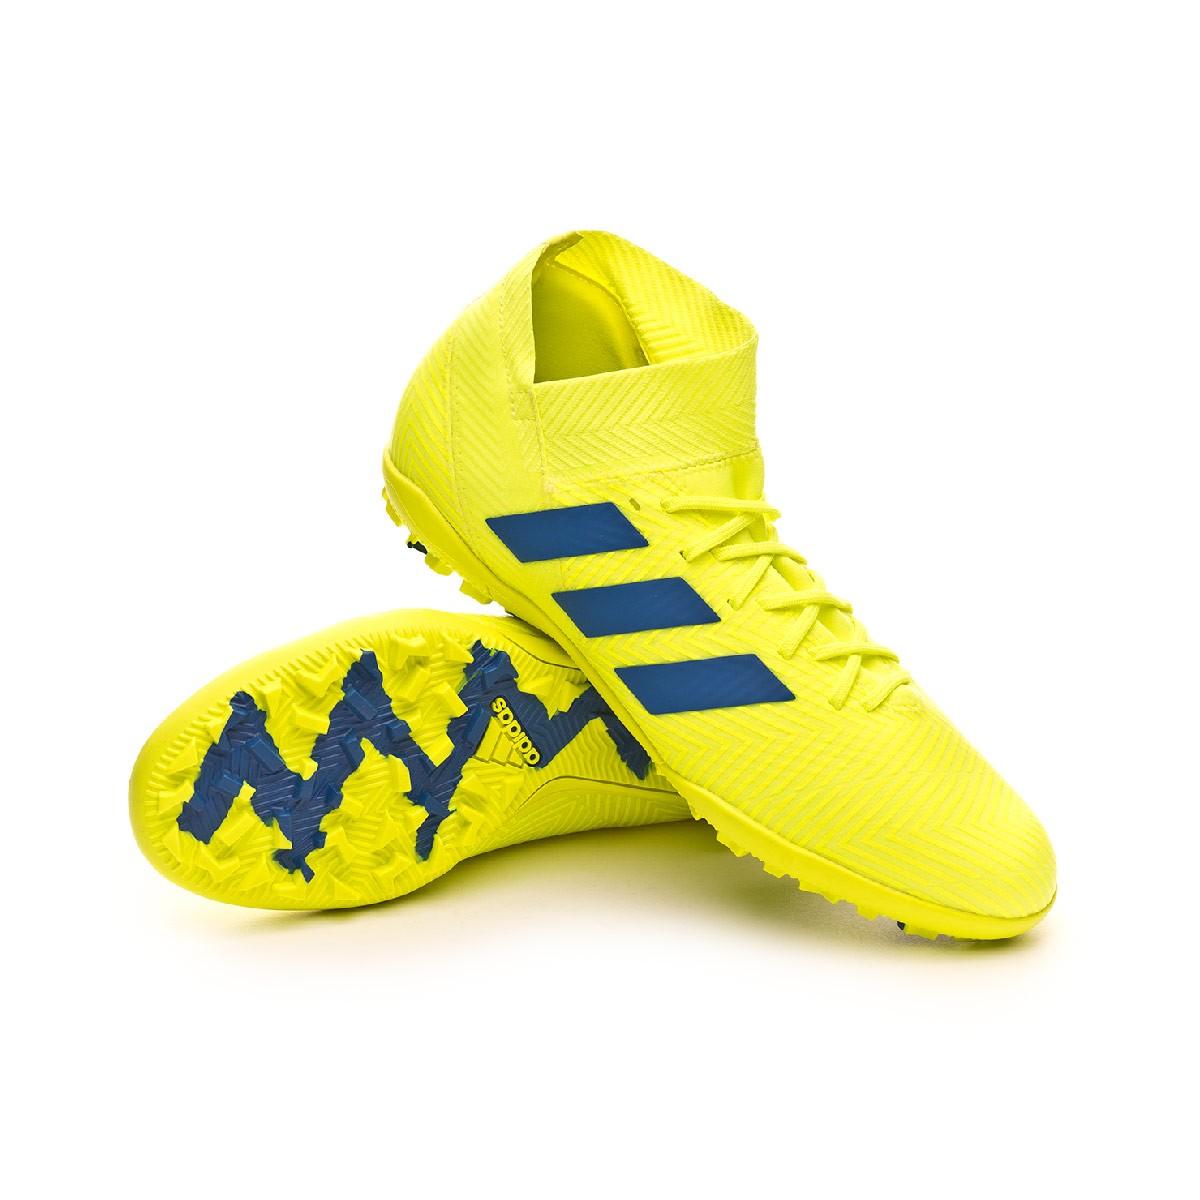 12e07d950bf3 Football Boot adidas Nemeziz Tango 18.3 Turf Solar yellow-Football  blue-Active red - Football store Fútbol Emotion